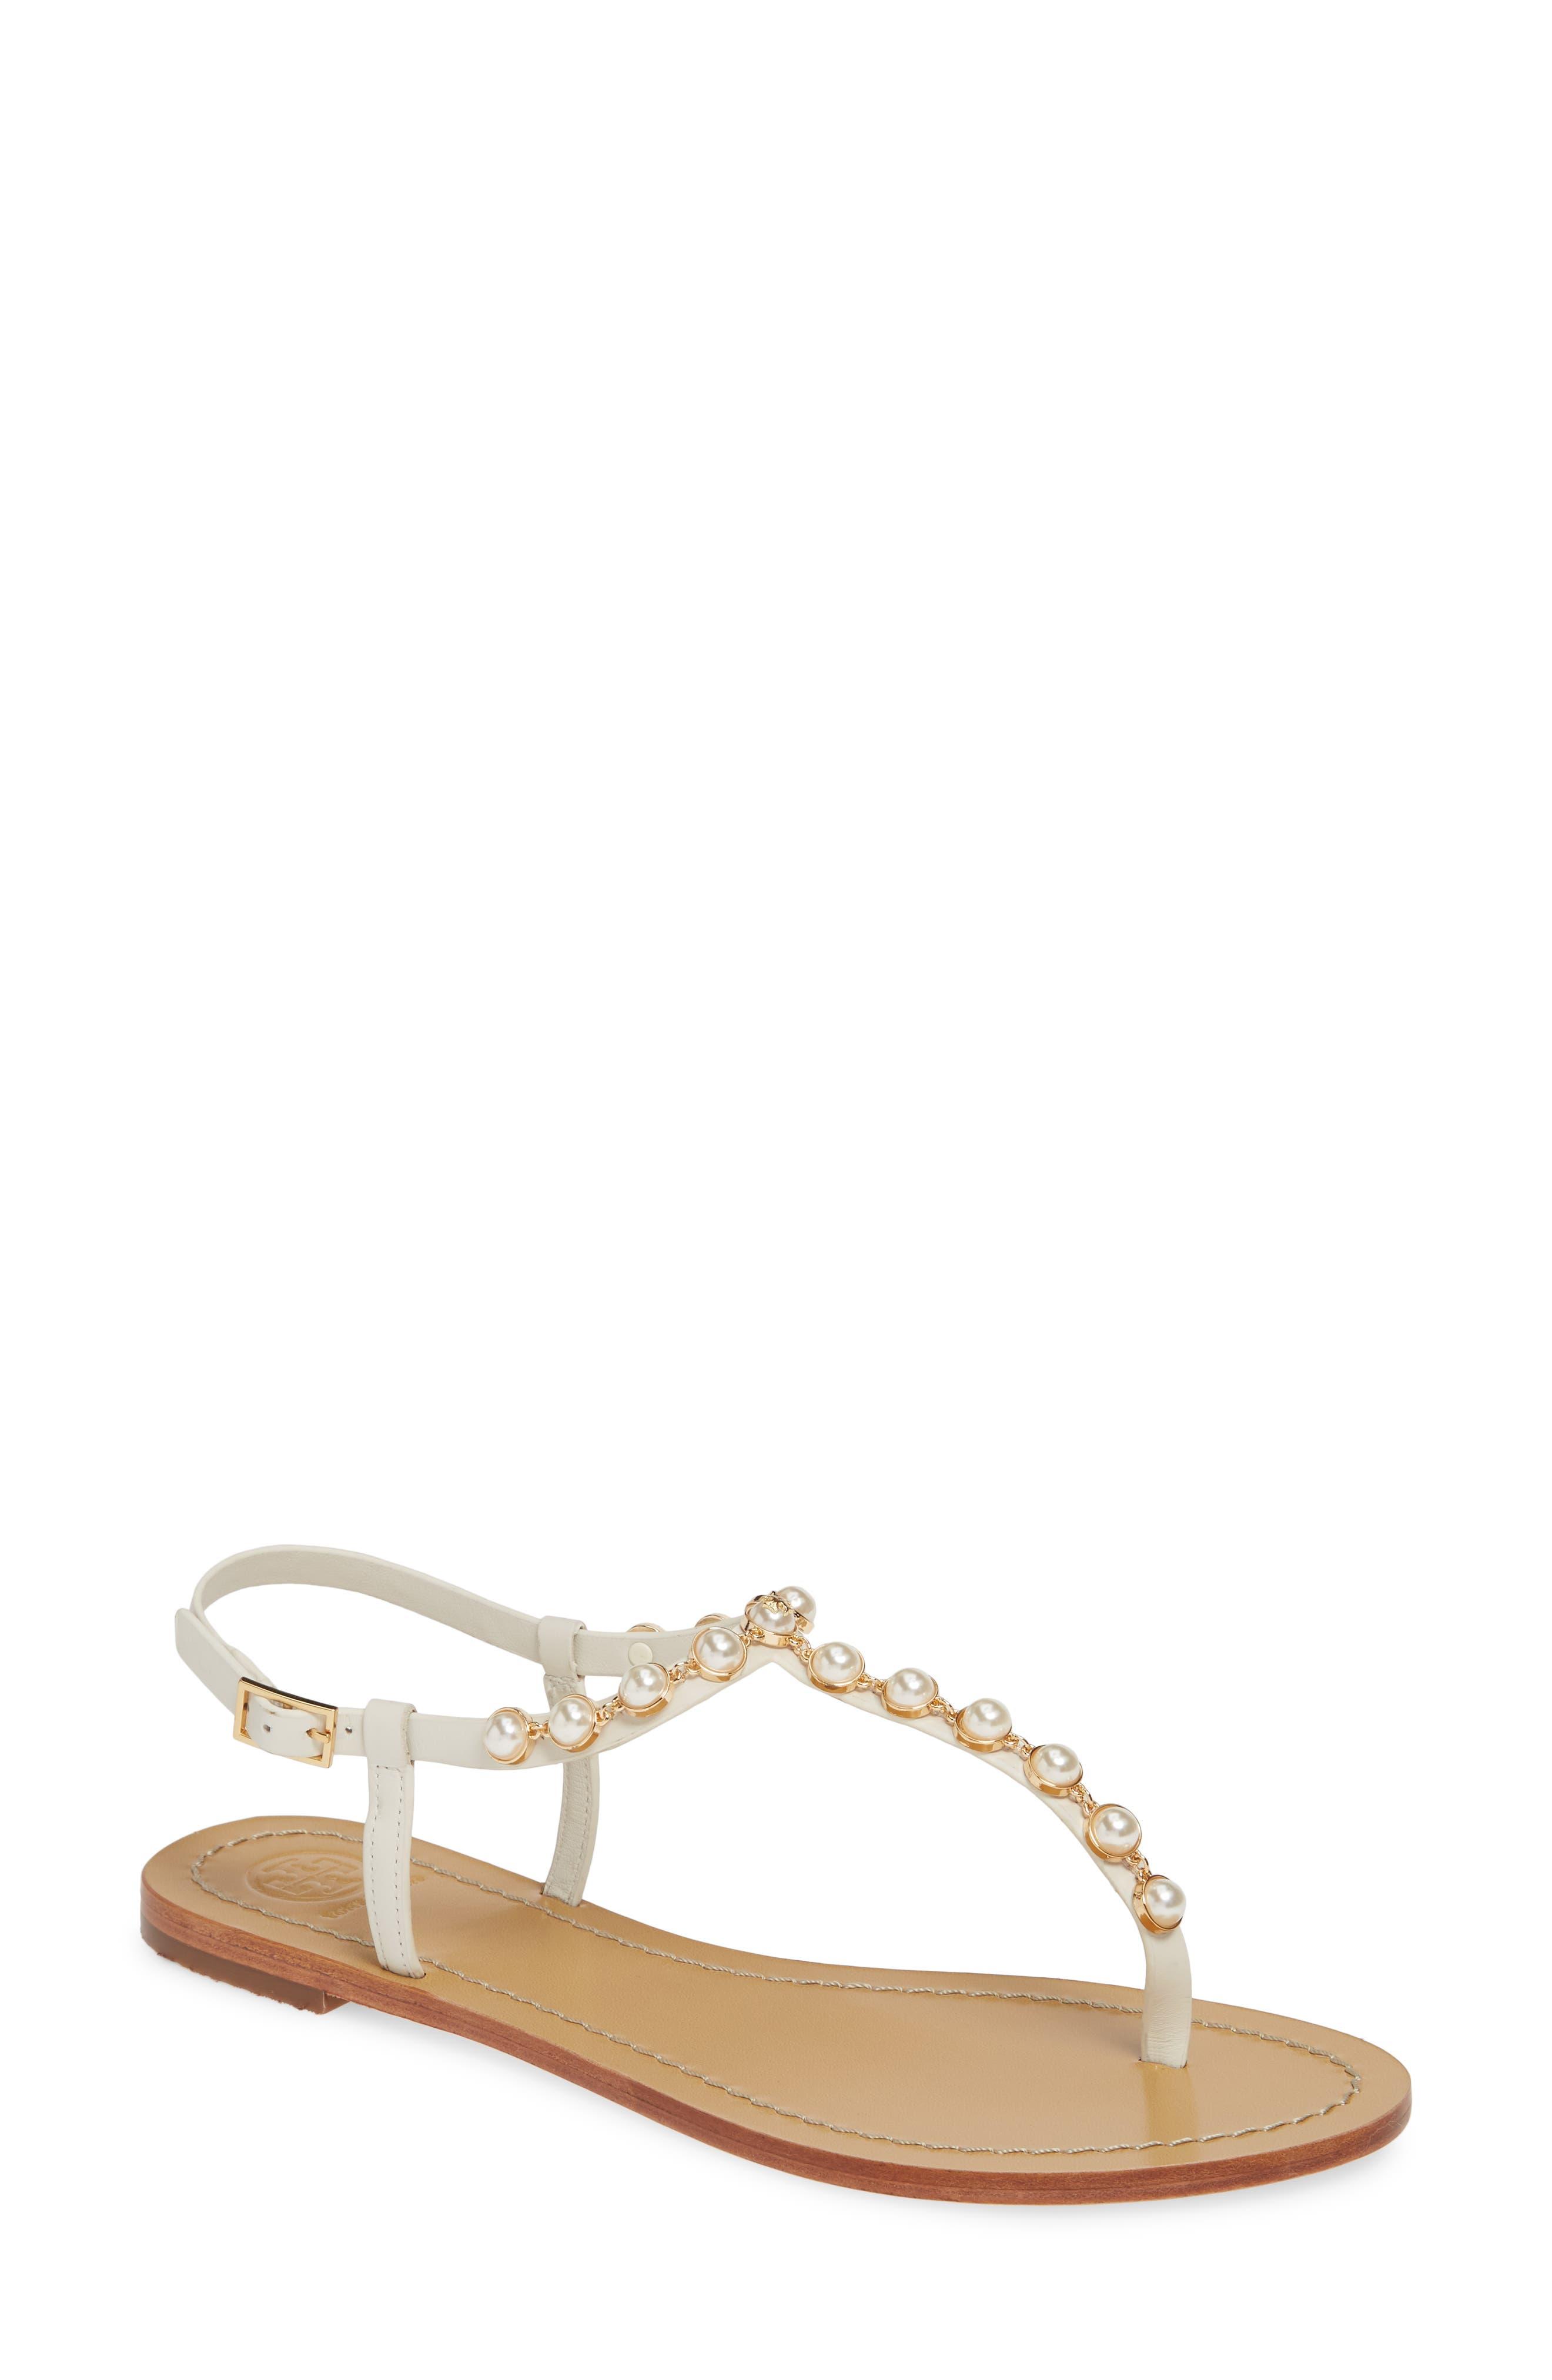 Tory Burch Emmy Embellished T-Strap Sandal